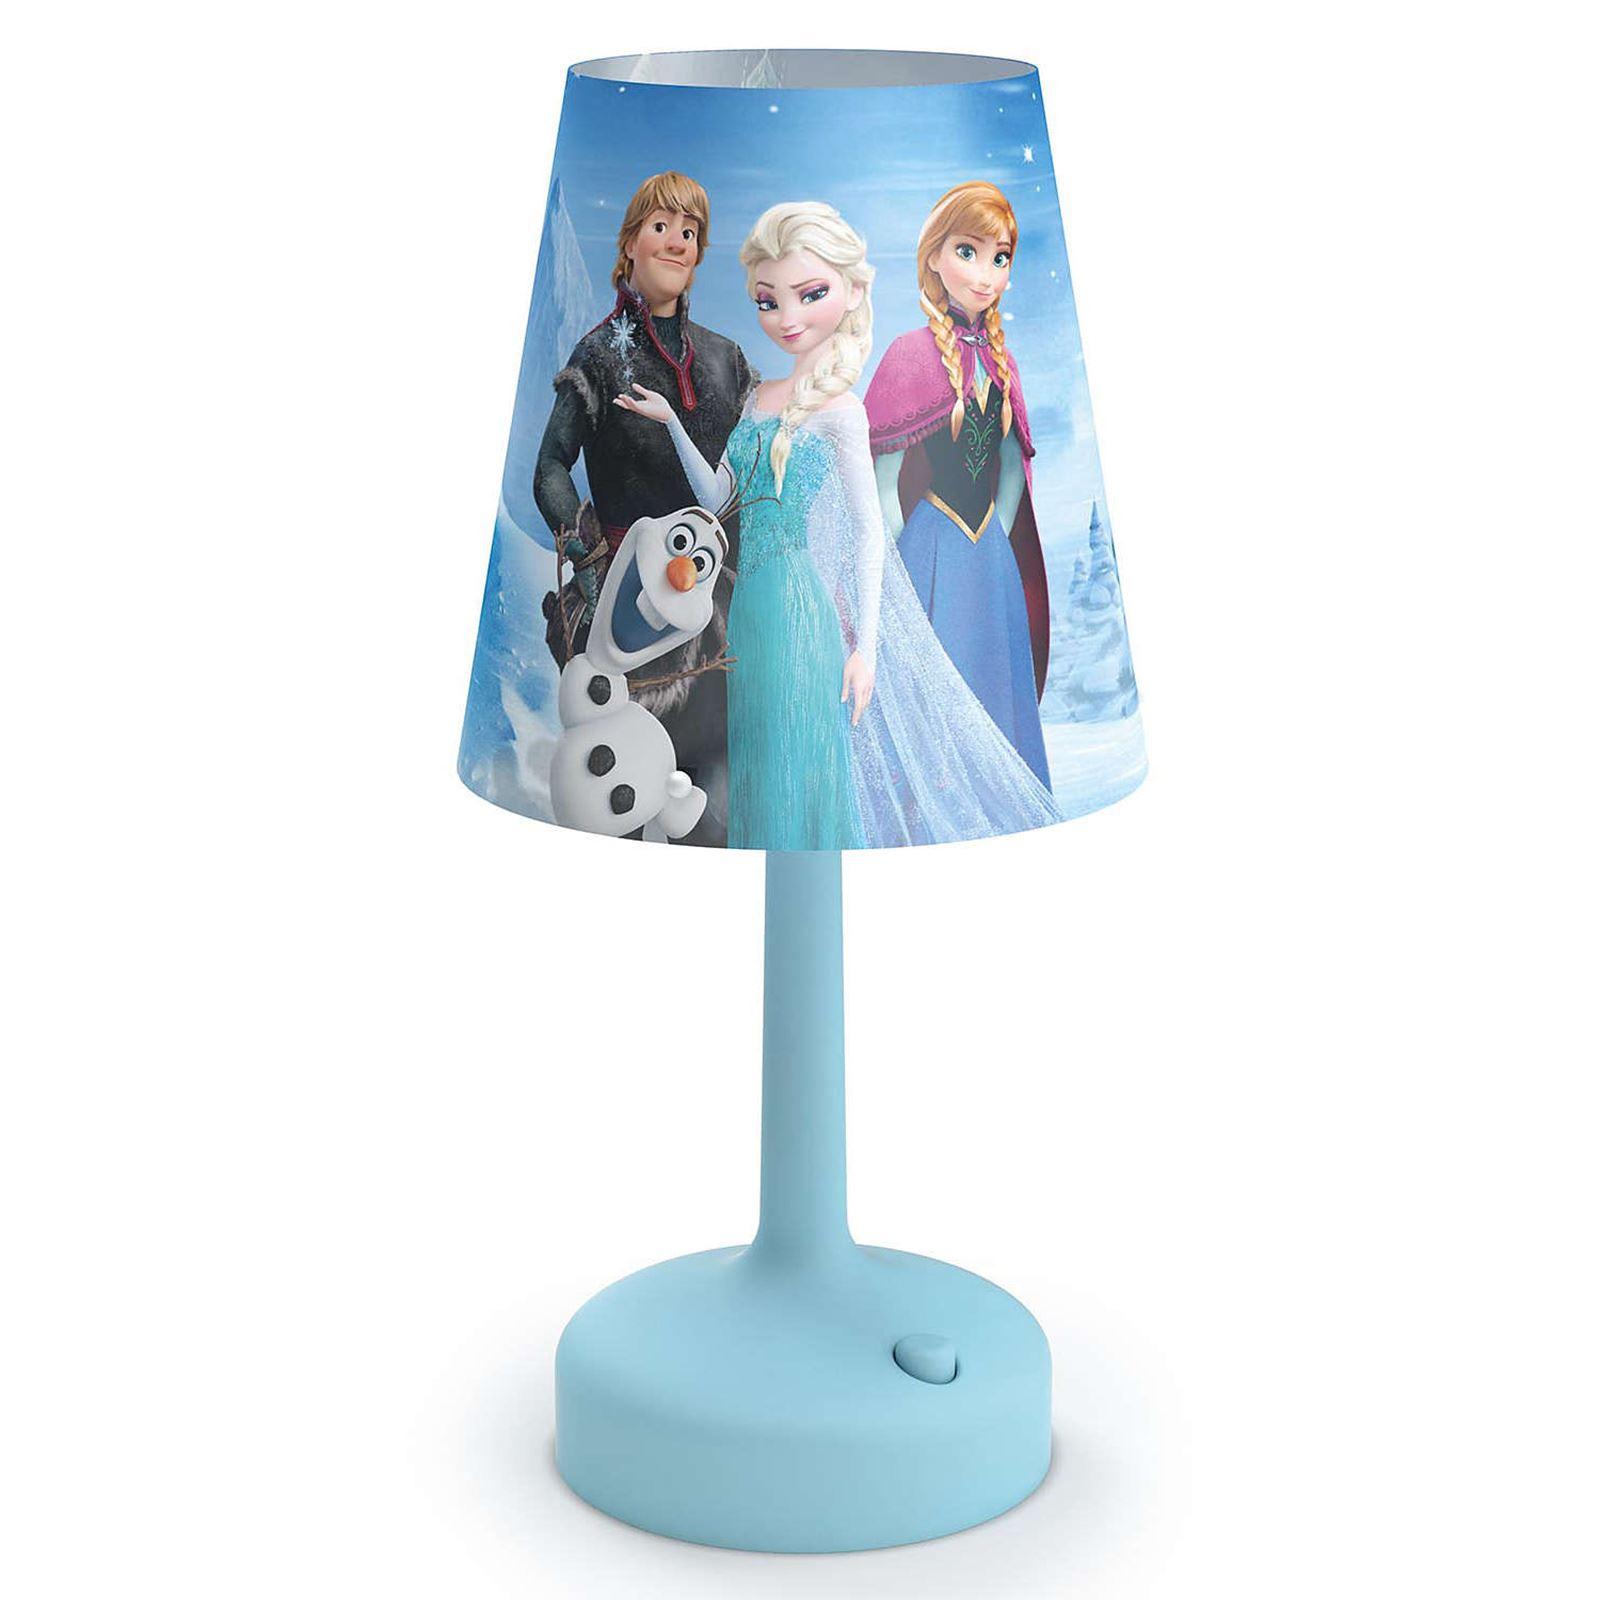 PHILIPS KIDS BED SIDE LAMPS VARIOUS DESIGNS LIGHTING ...